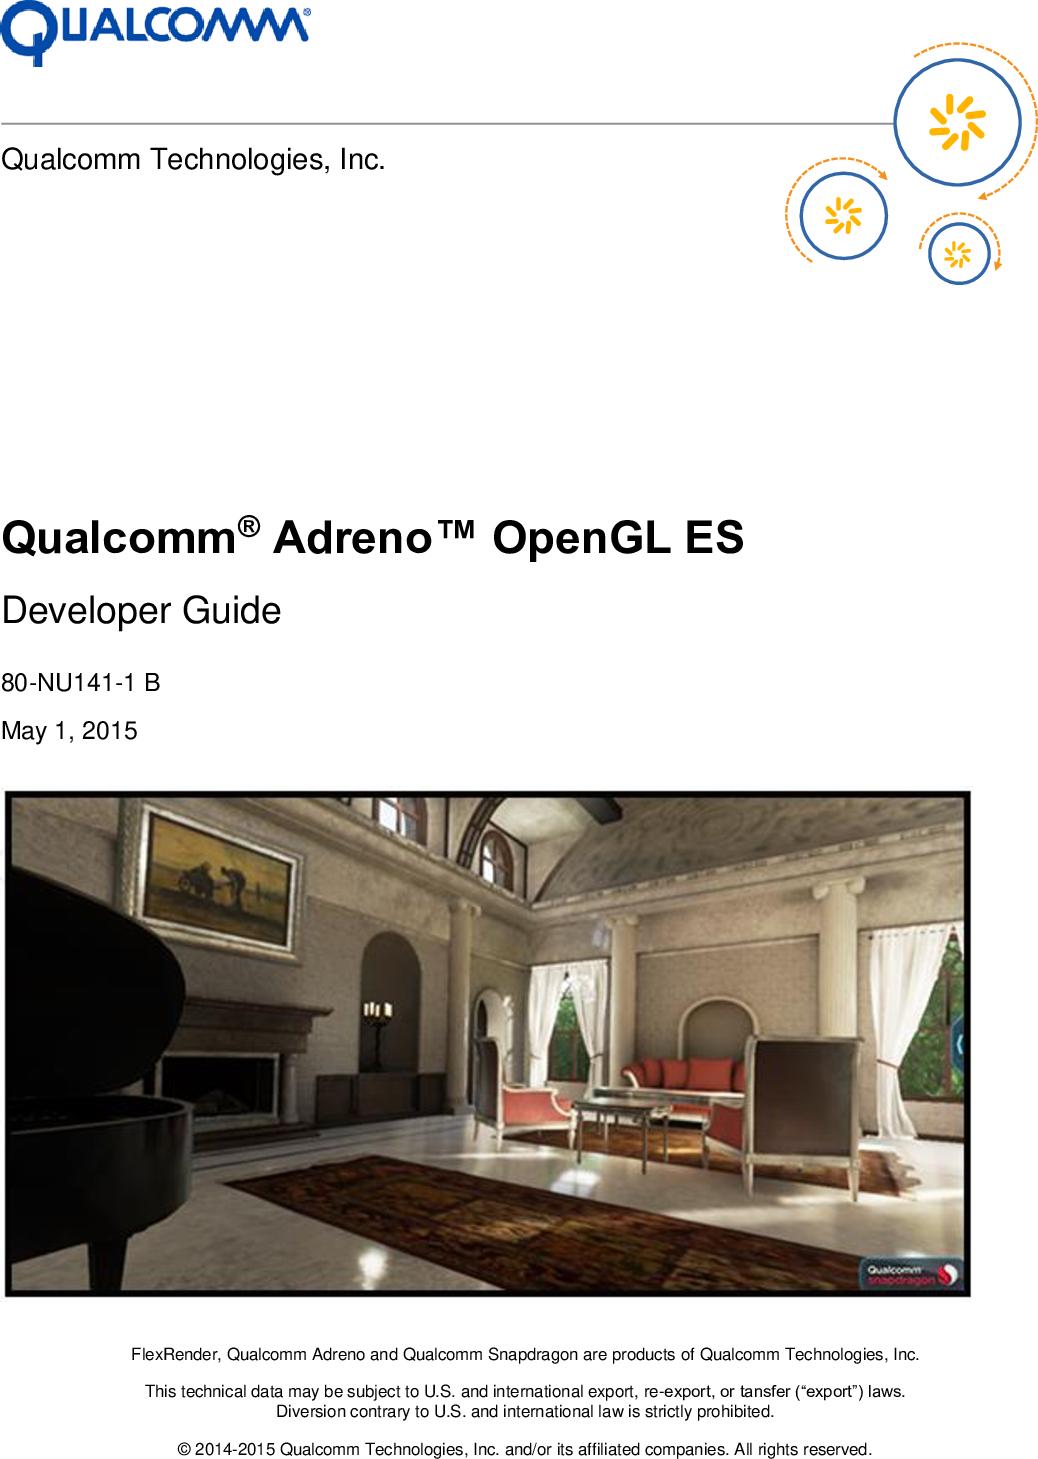 Qualcomm_Adreno_OpenGL_ES_Developer_Guide Qualcomm® Adreno™ Open GL